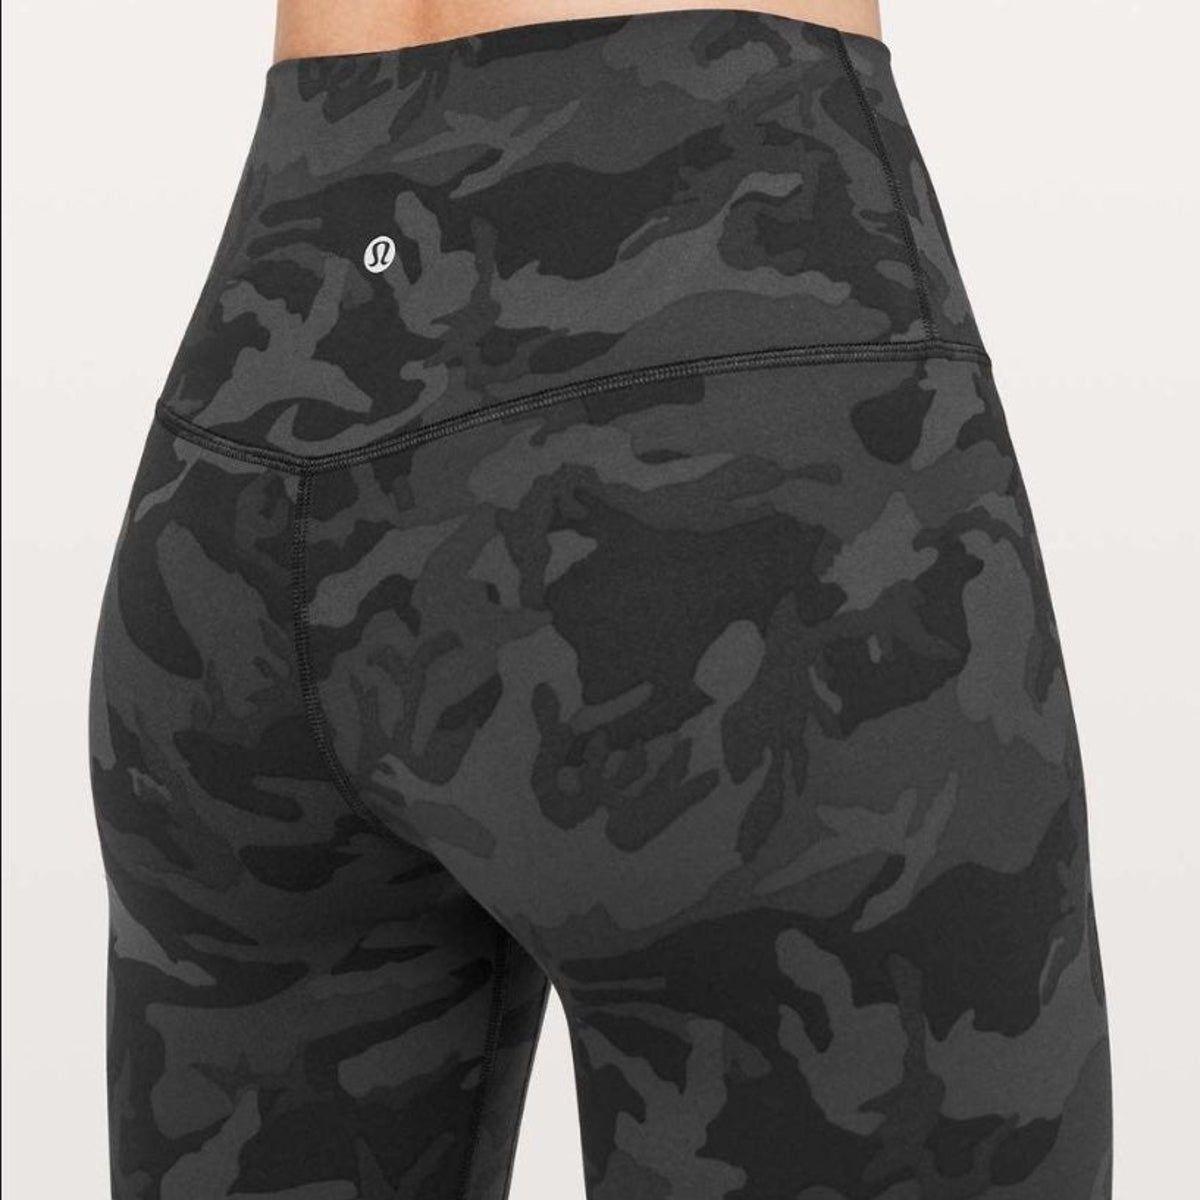 Lululemon Align Pant Incognito Camo 2 On Mercari Lululemon Outfits Lulu Leggings Lululemon Align Pant